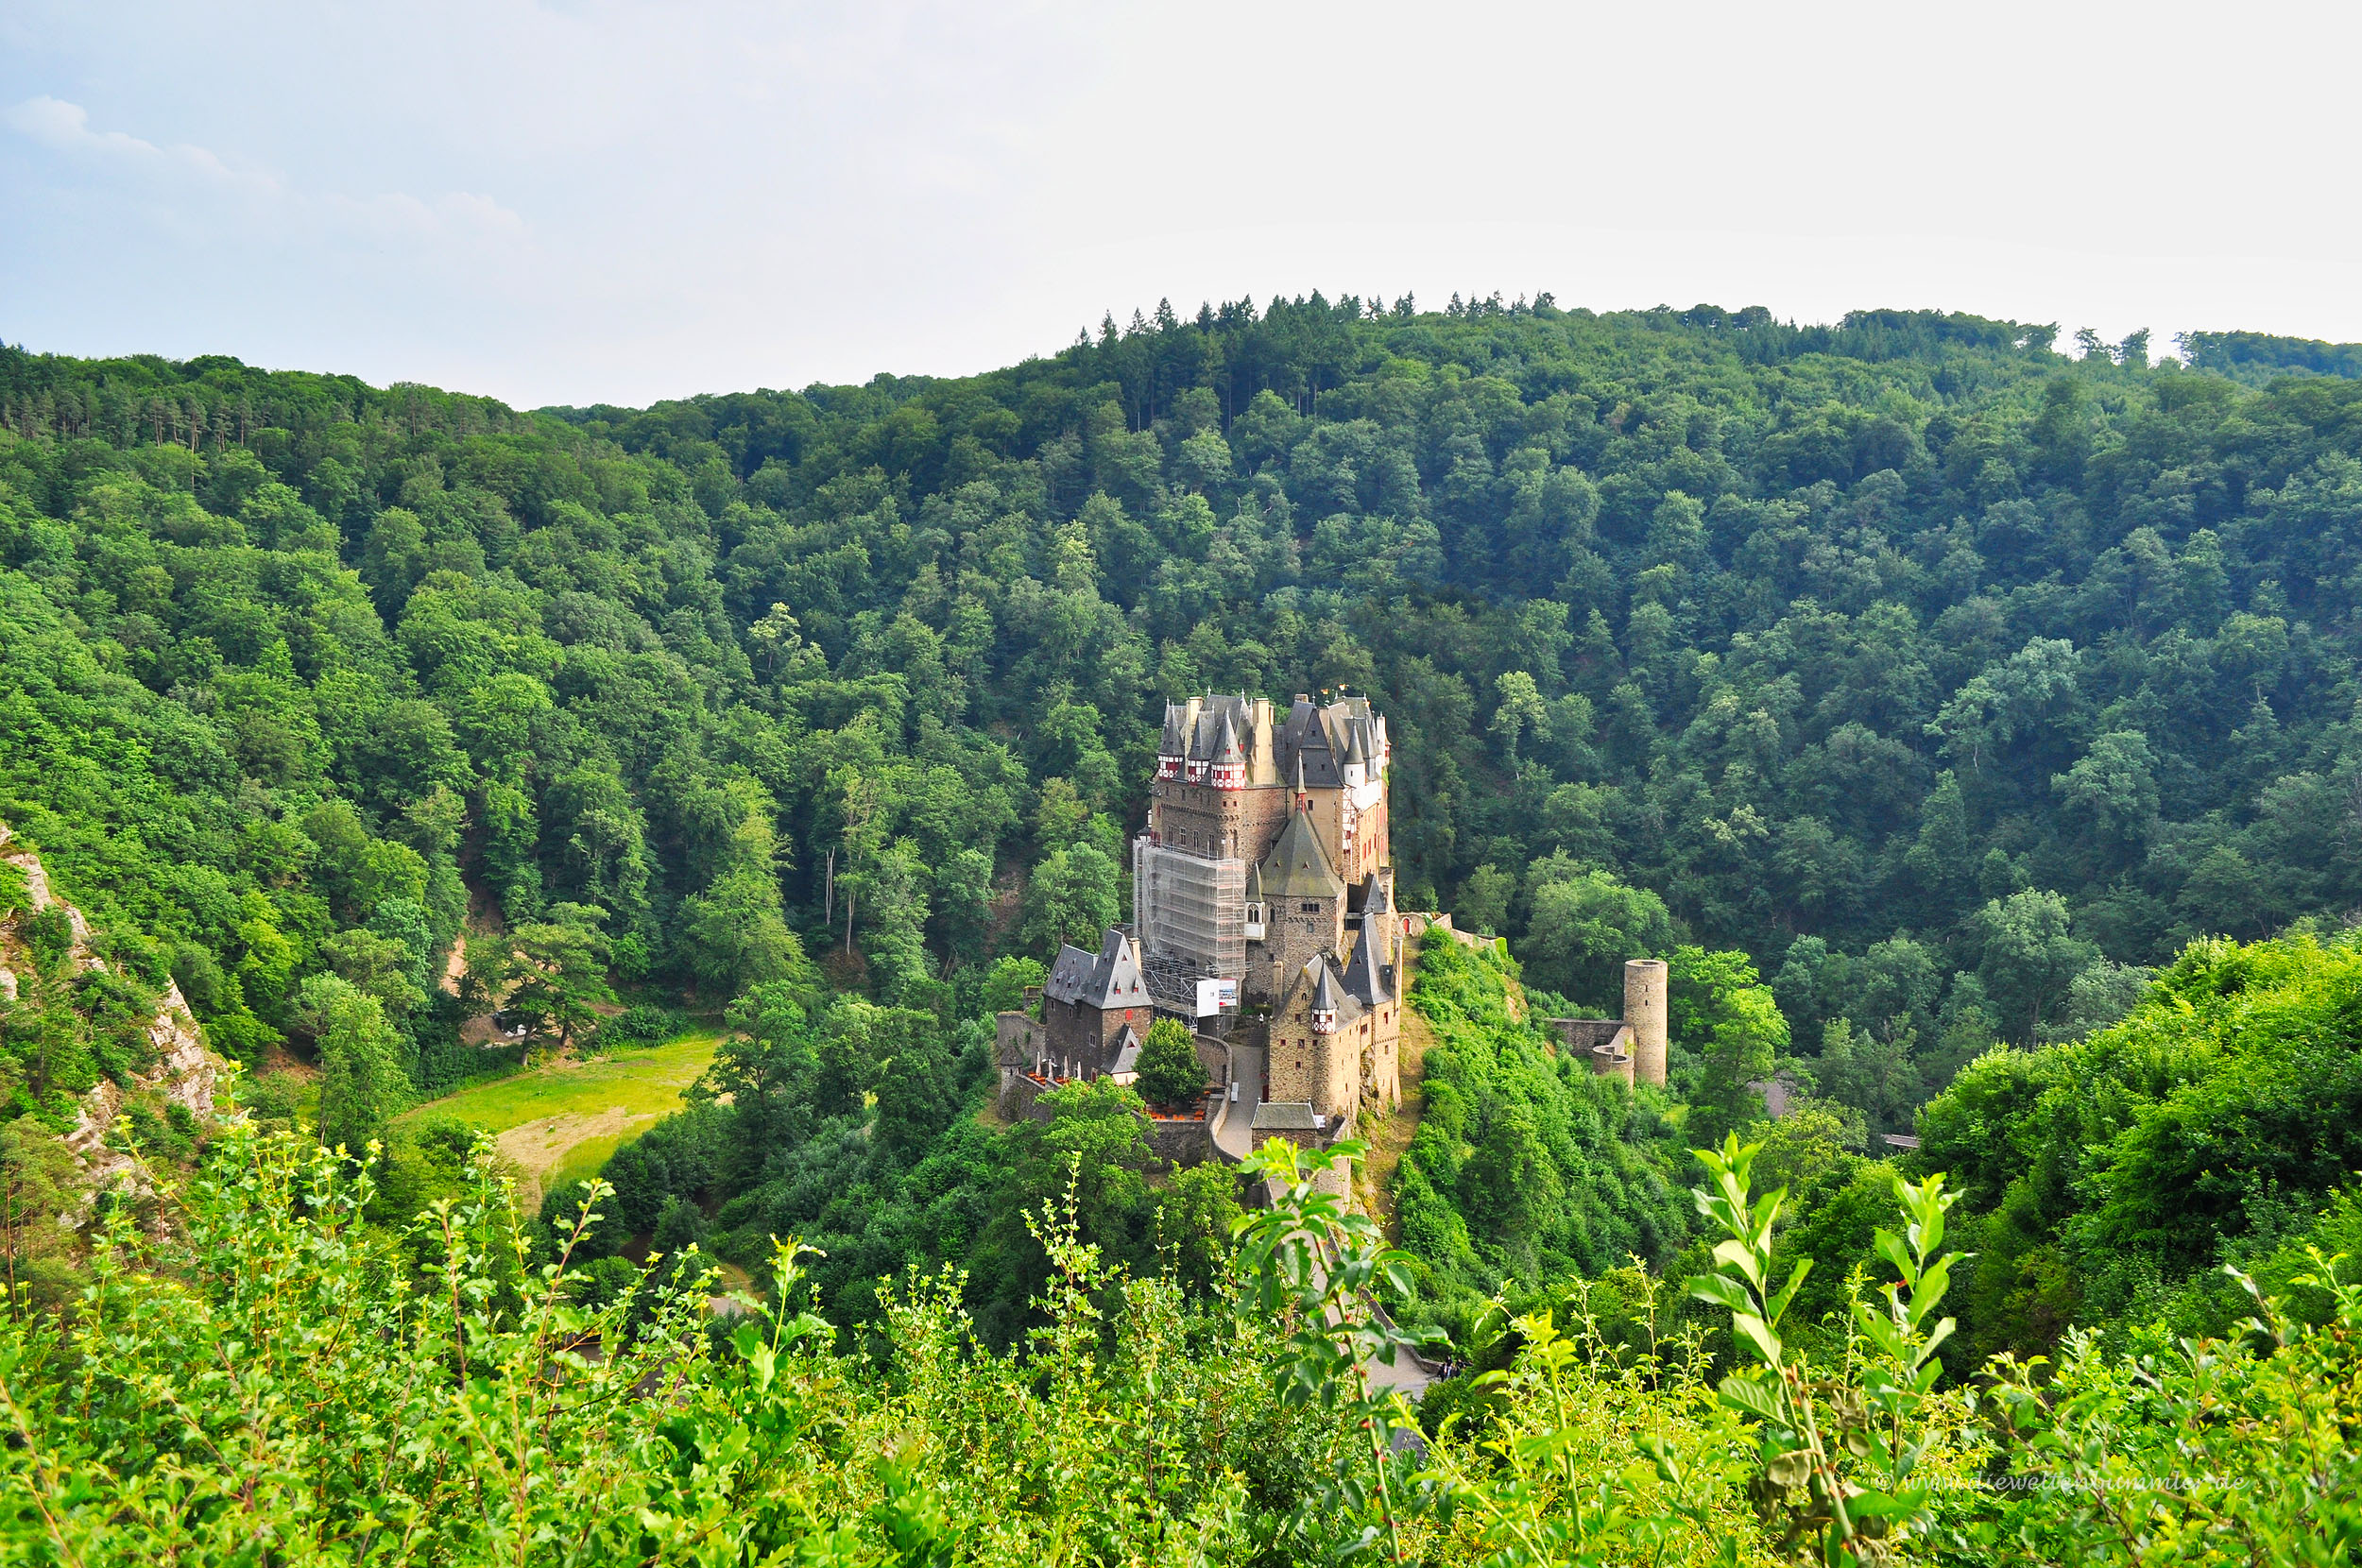 Einsame Burg an der Mosel